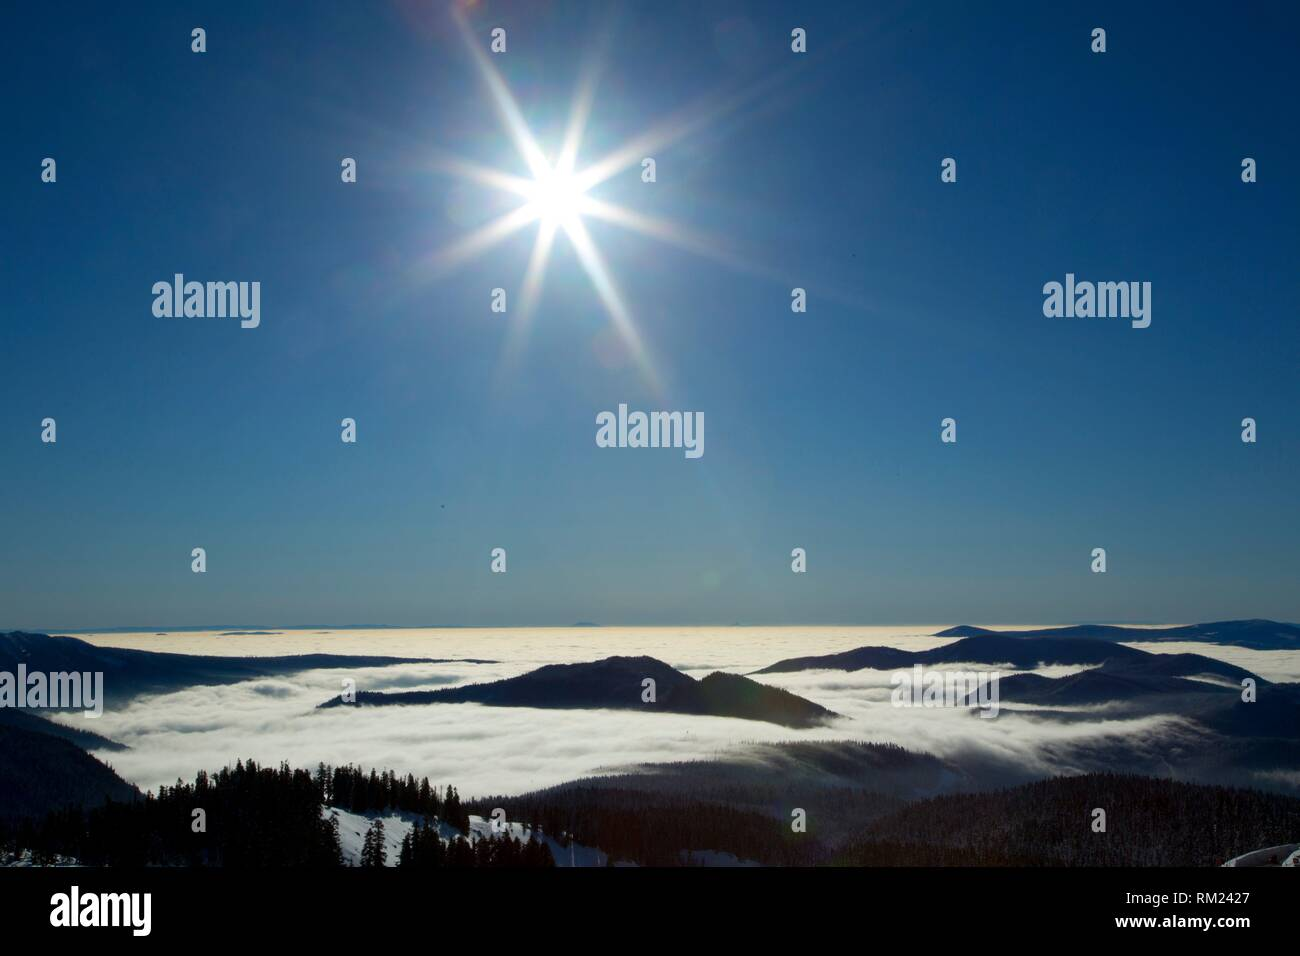 Fog with sunburst from Timberline, Mt Hood National Forest, Oregon. - Stock Image